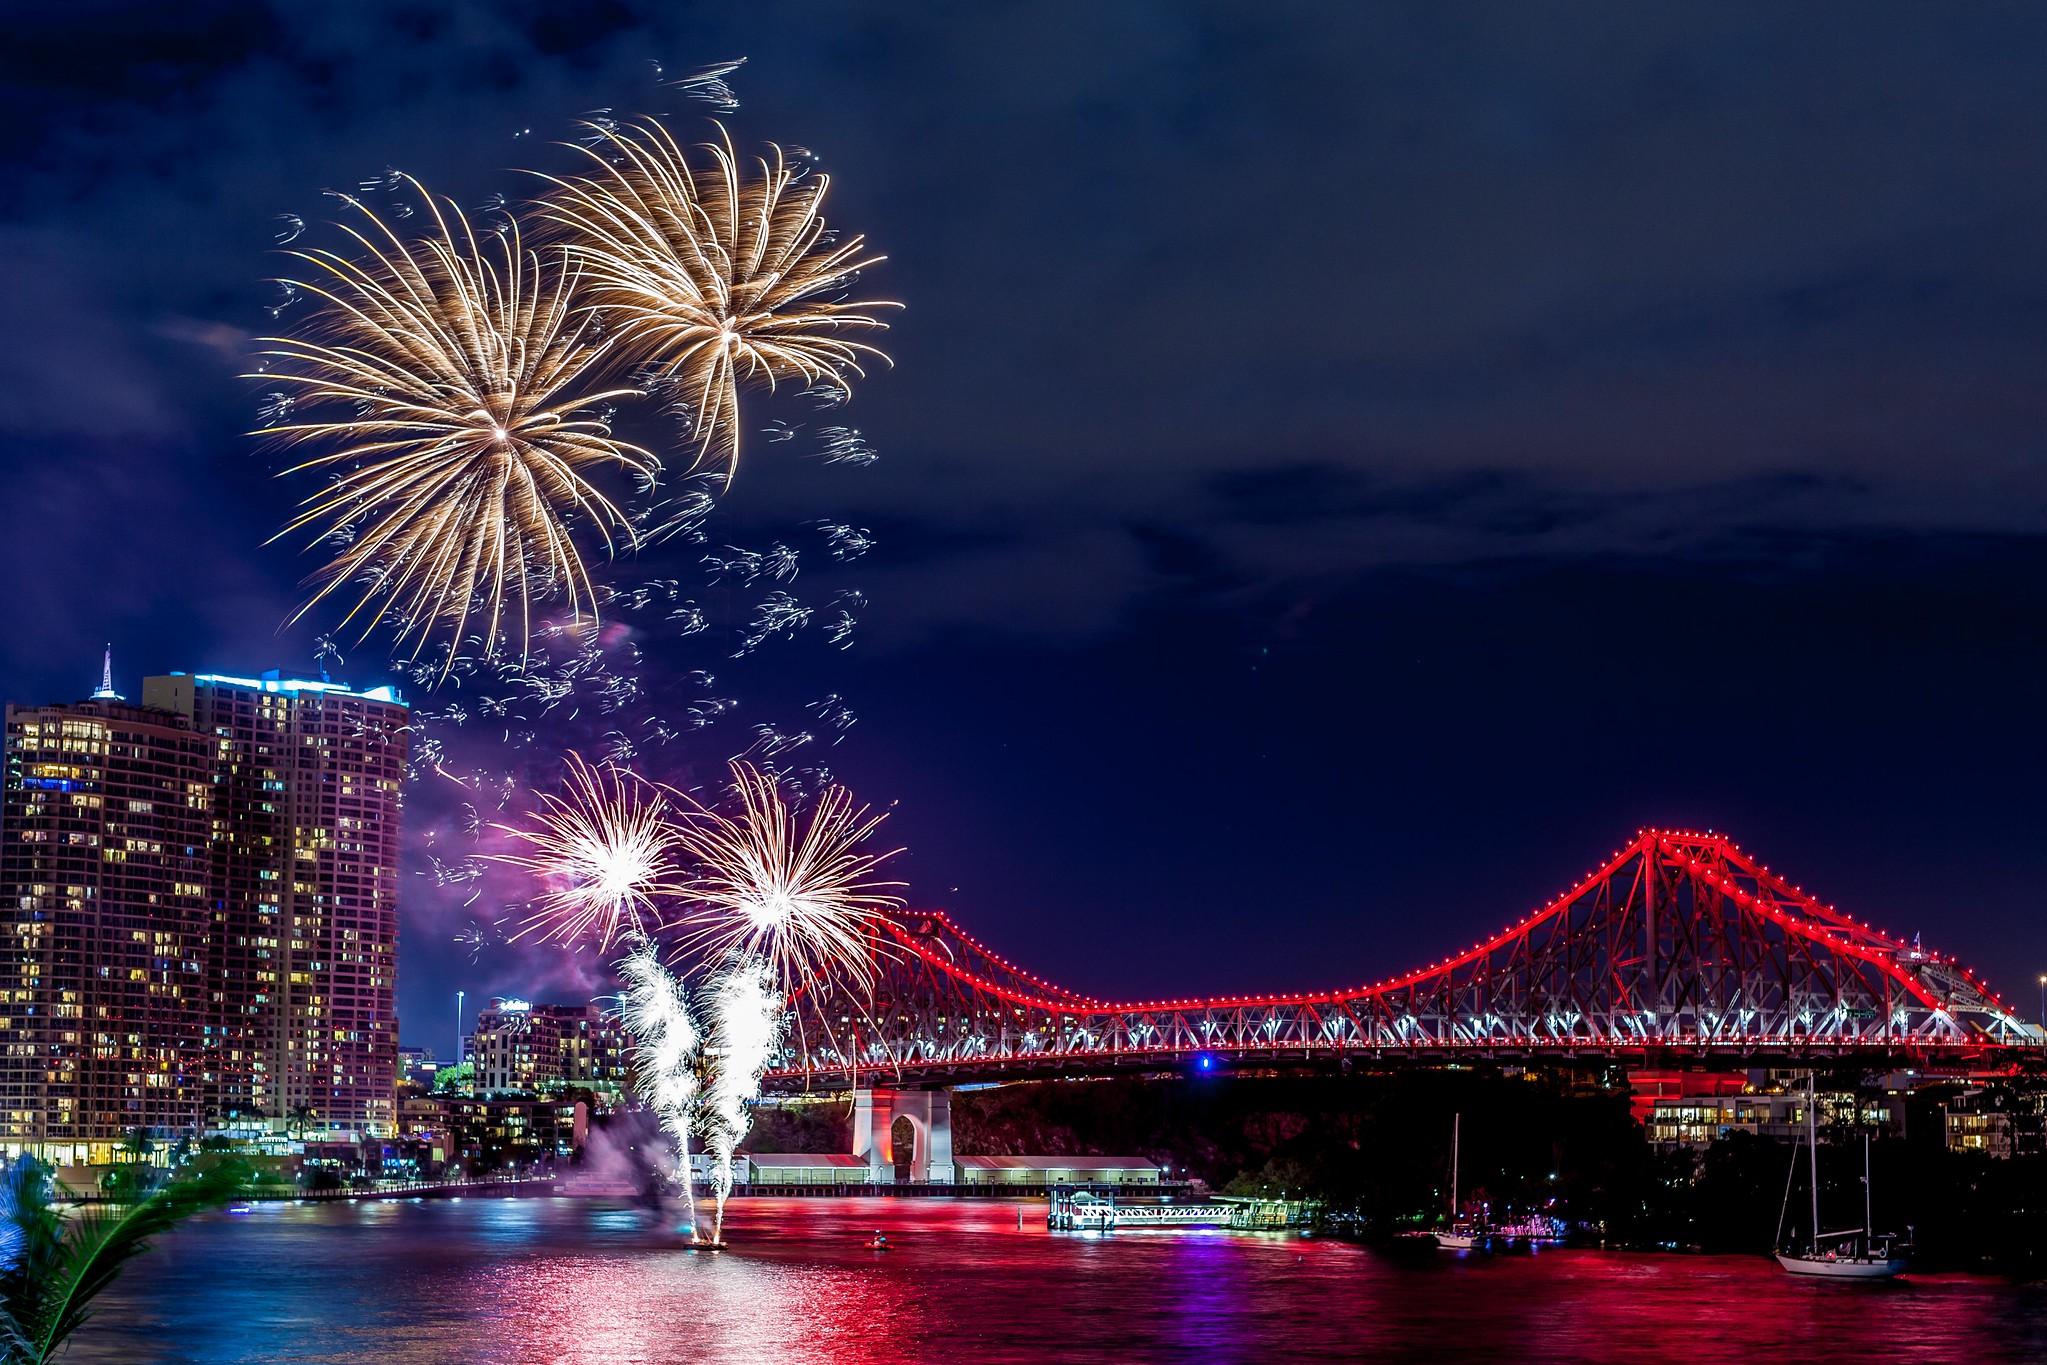 """Fireworks from Eagle Street Pier"" by Fishyone1 via Flickr"